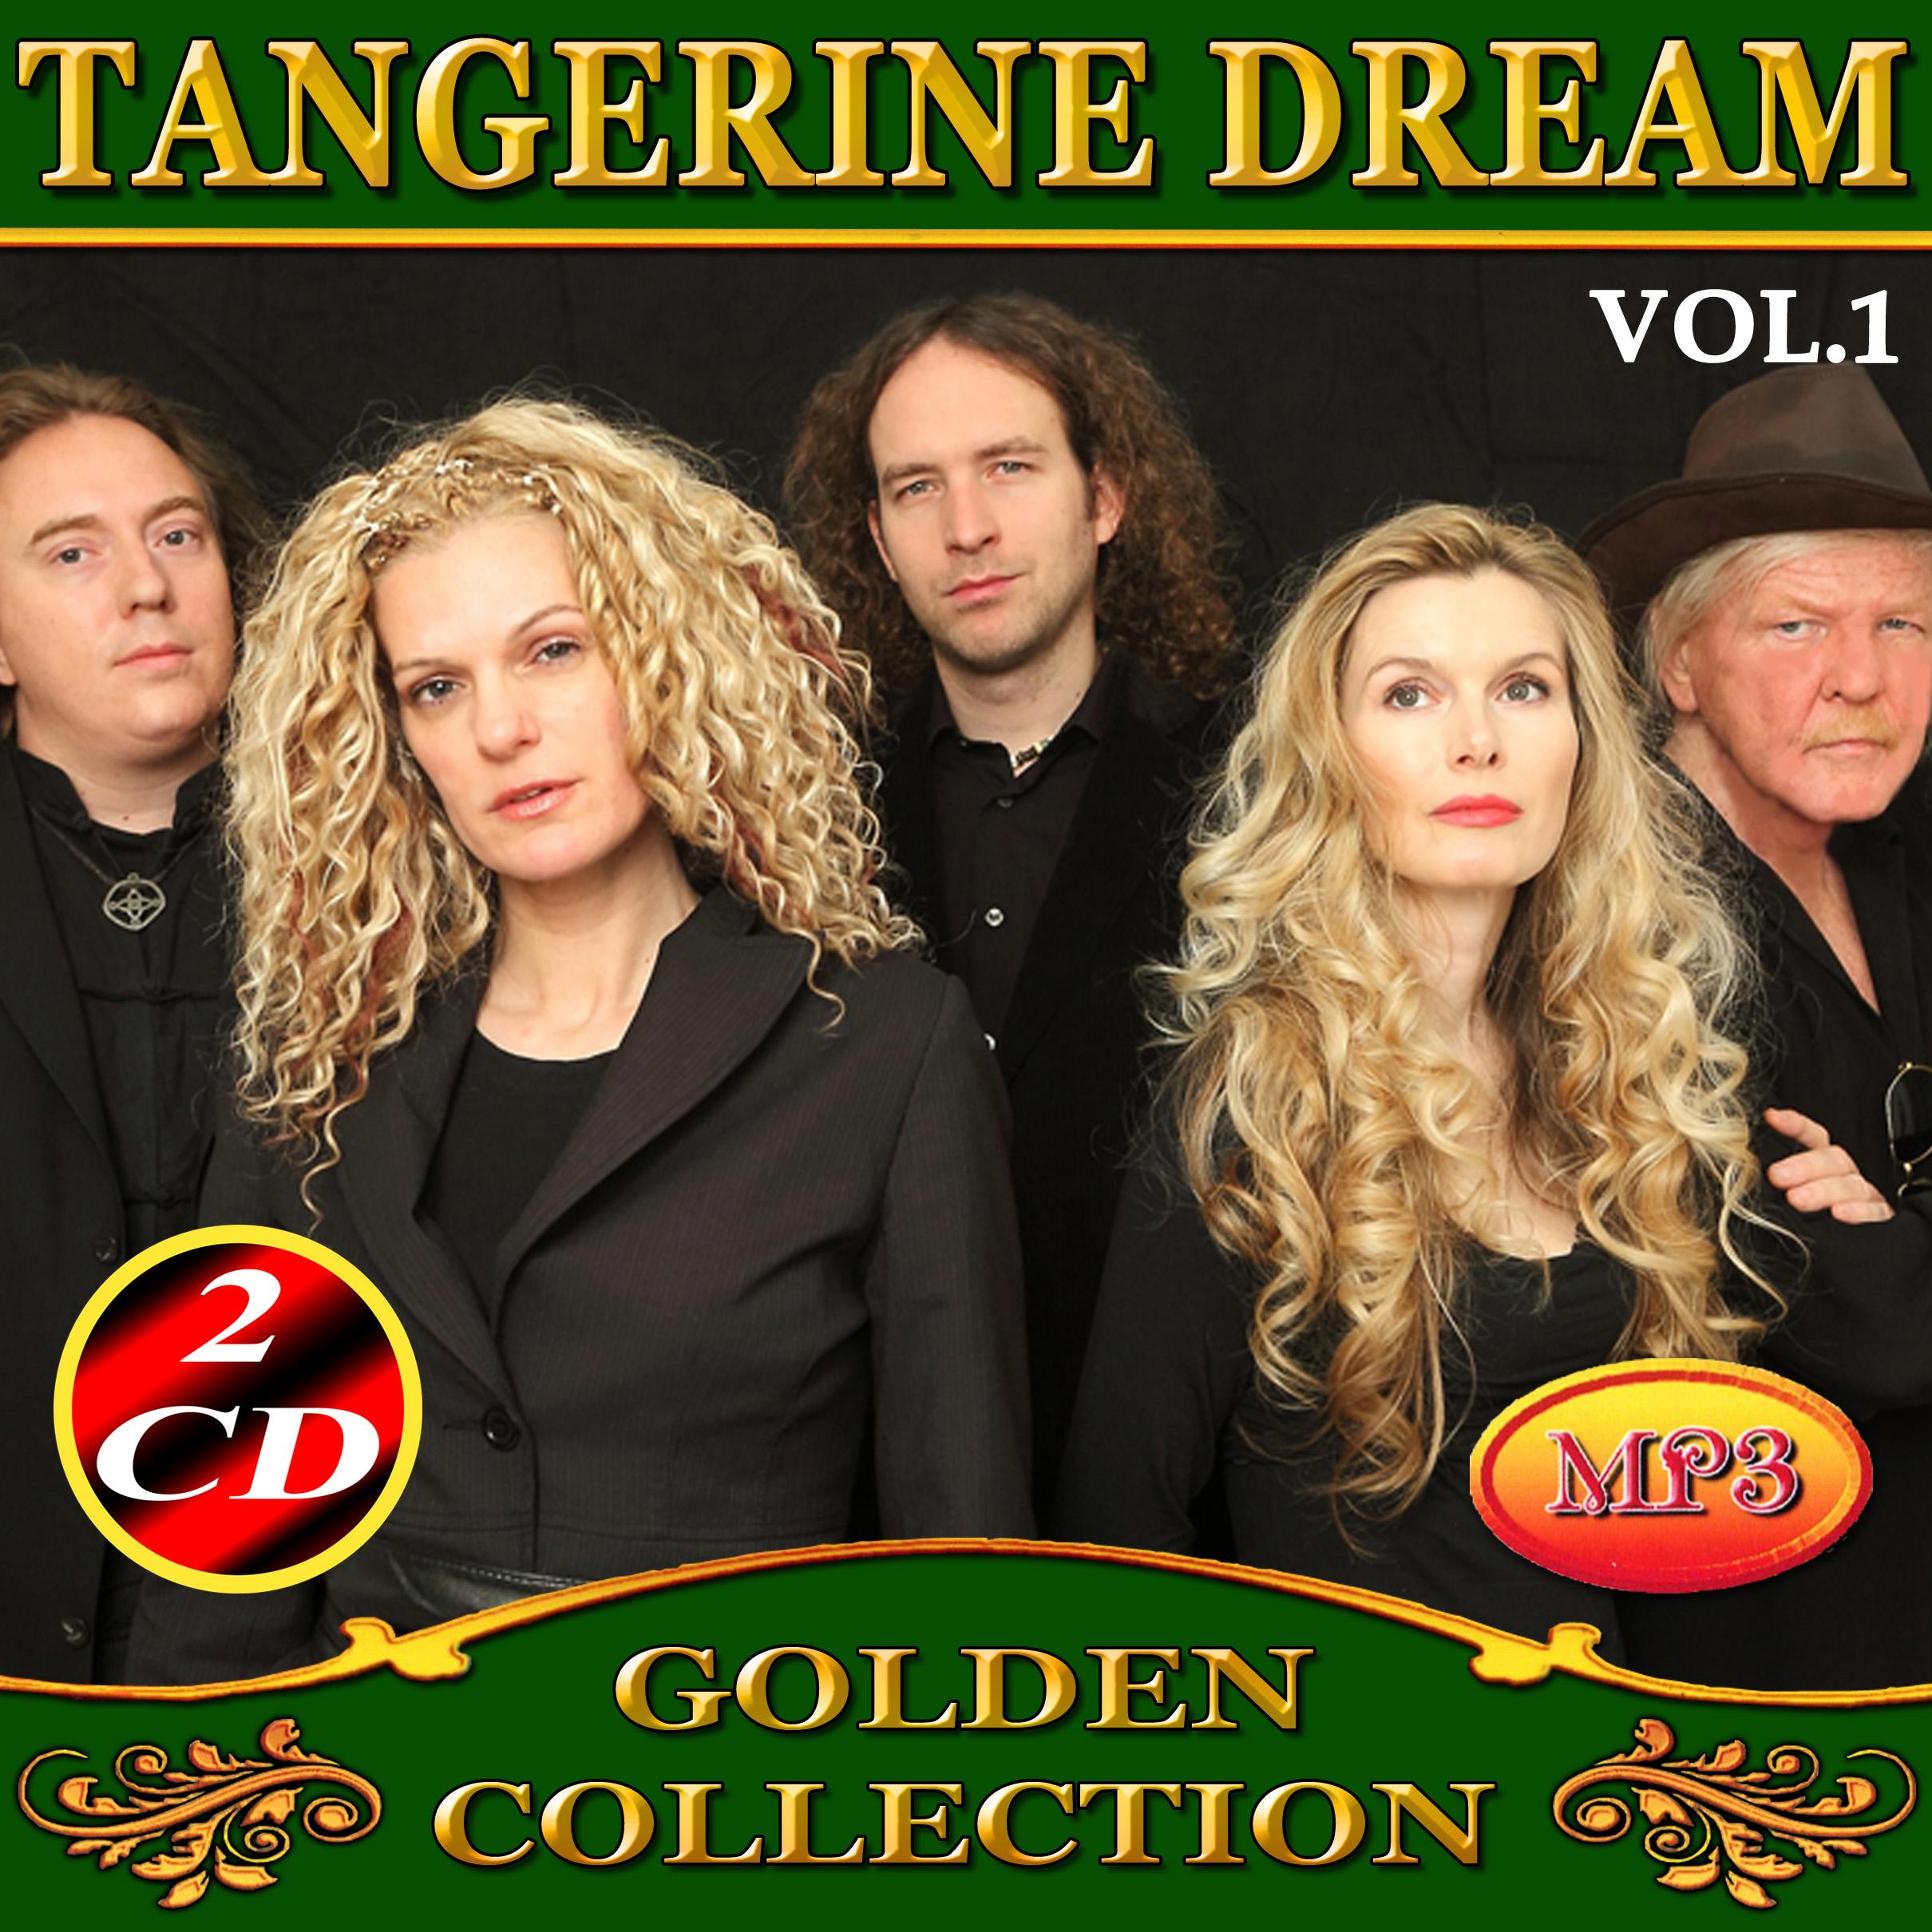 Tangerine Dream 1ч2cd [mp3]